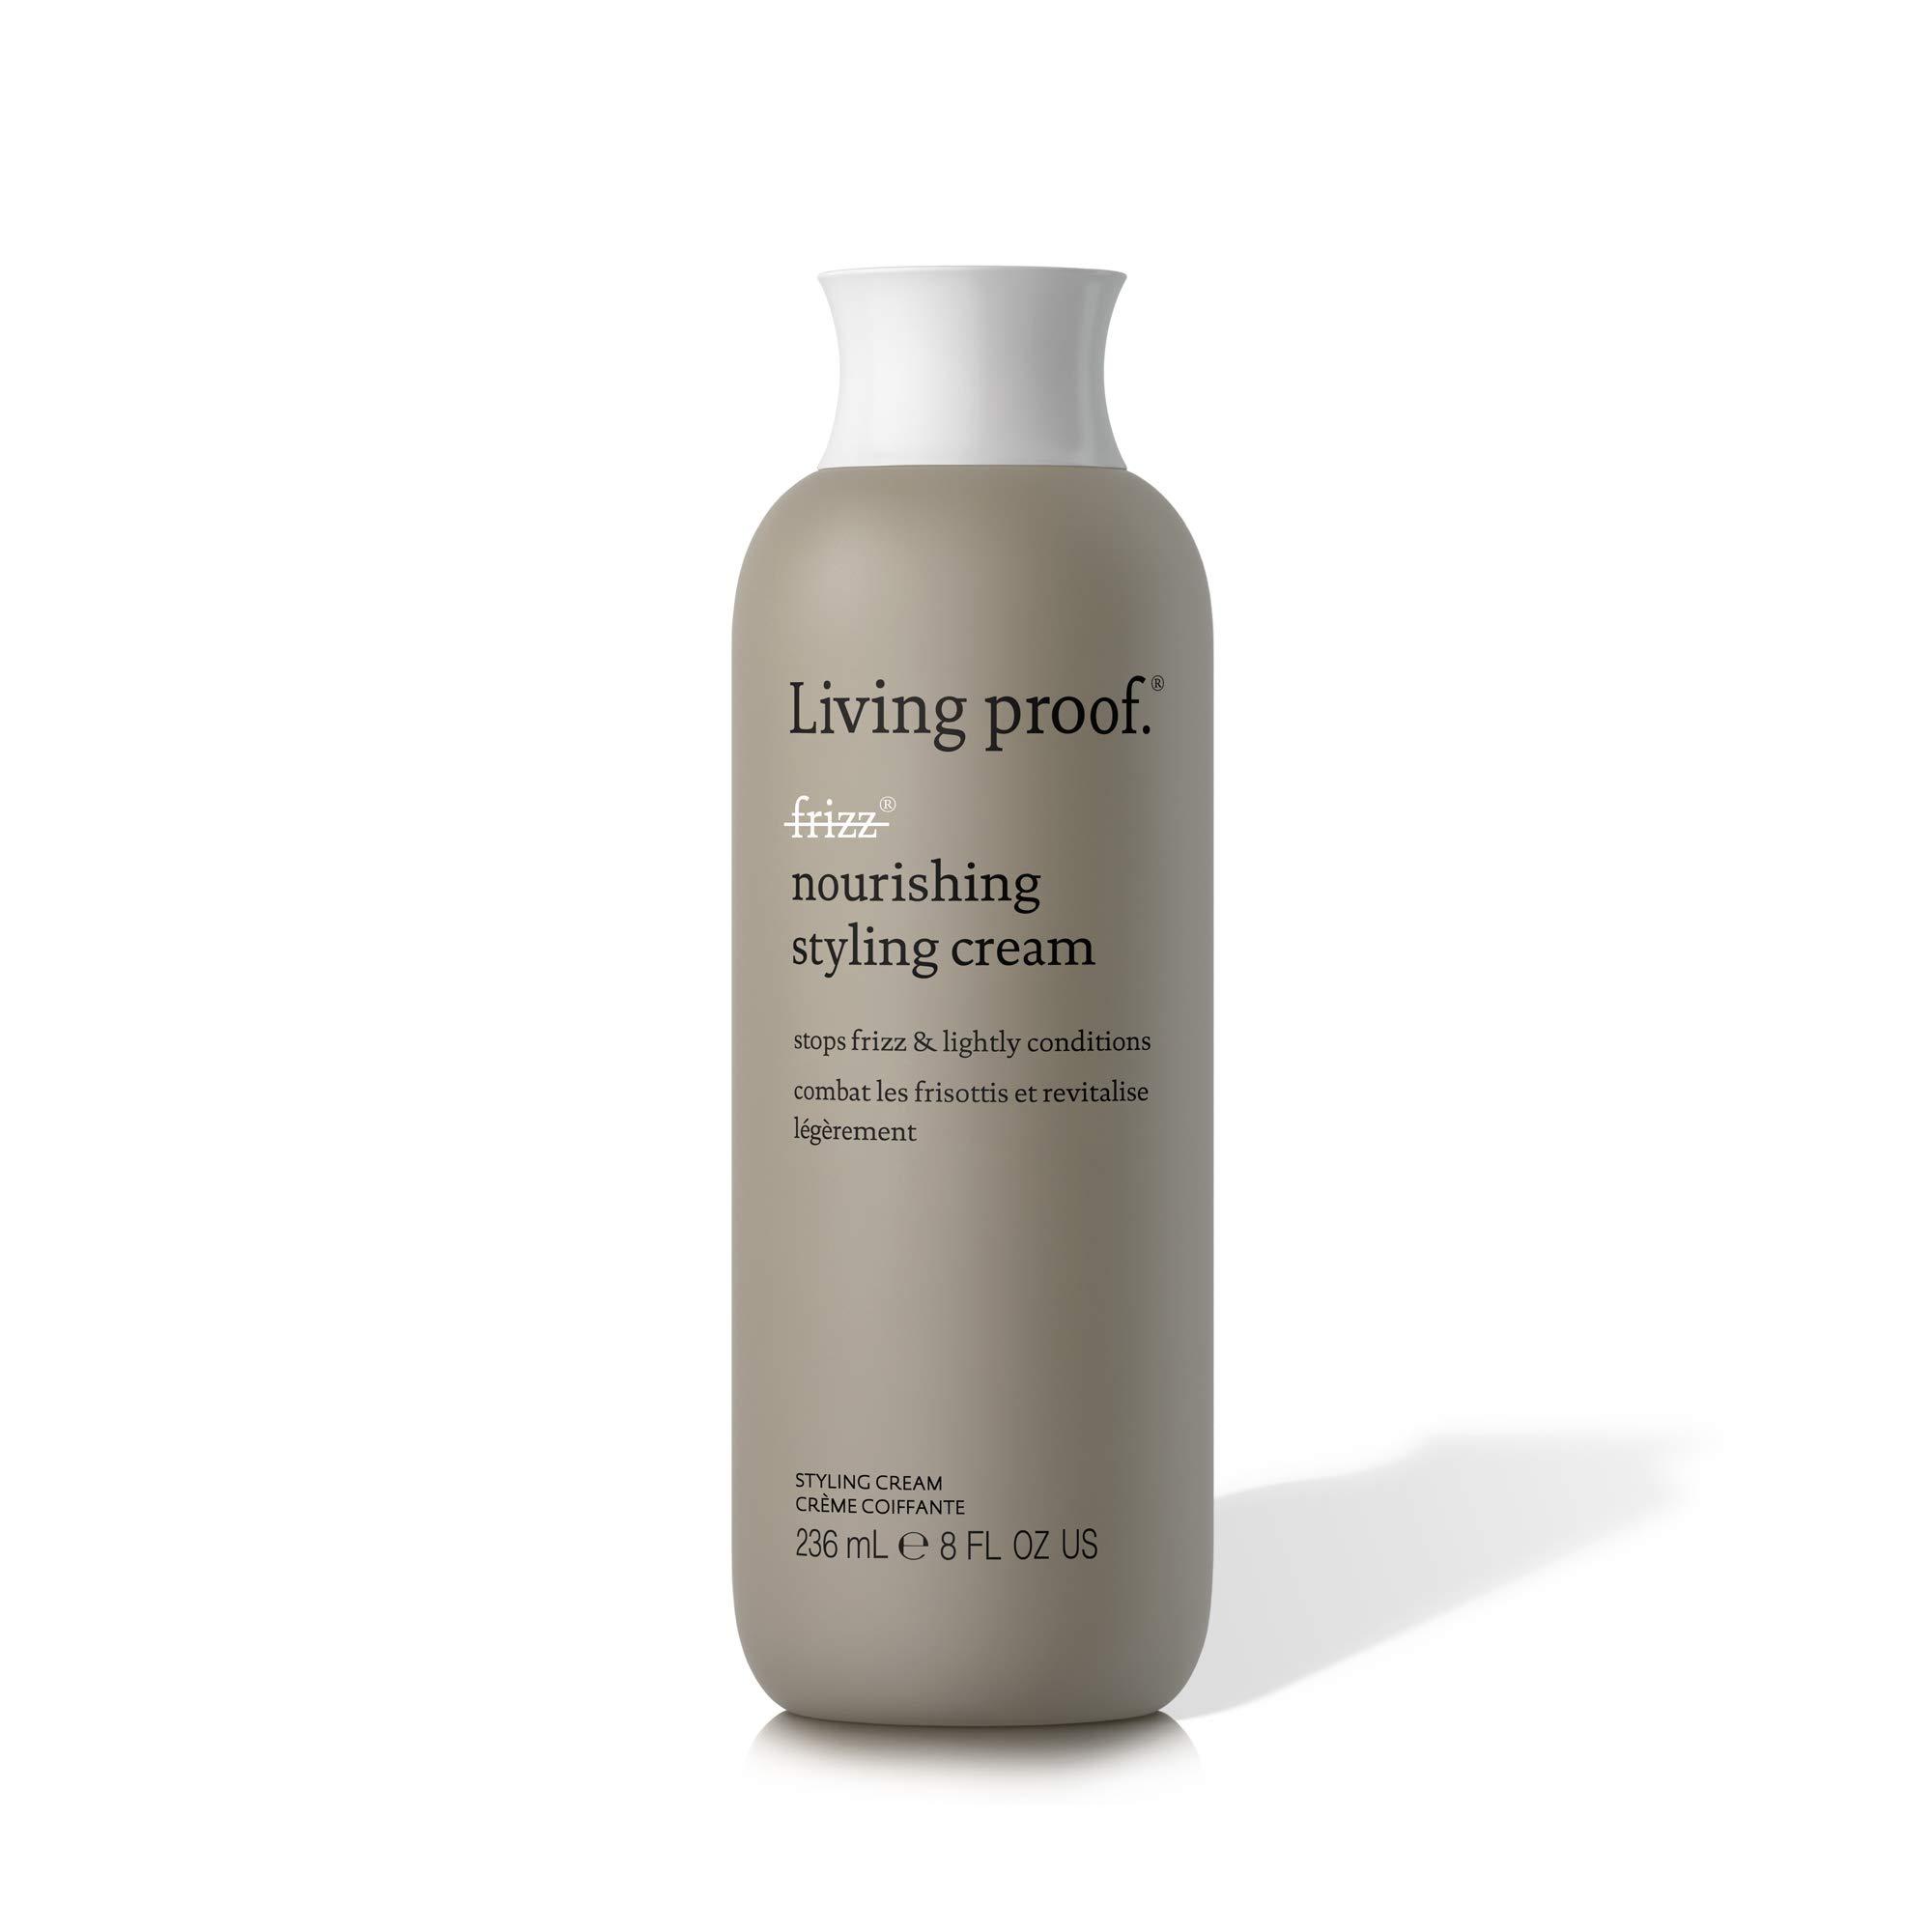 Living Proof - Living Proof No Frizz Nourishing Styling Cream, 8 oz